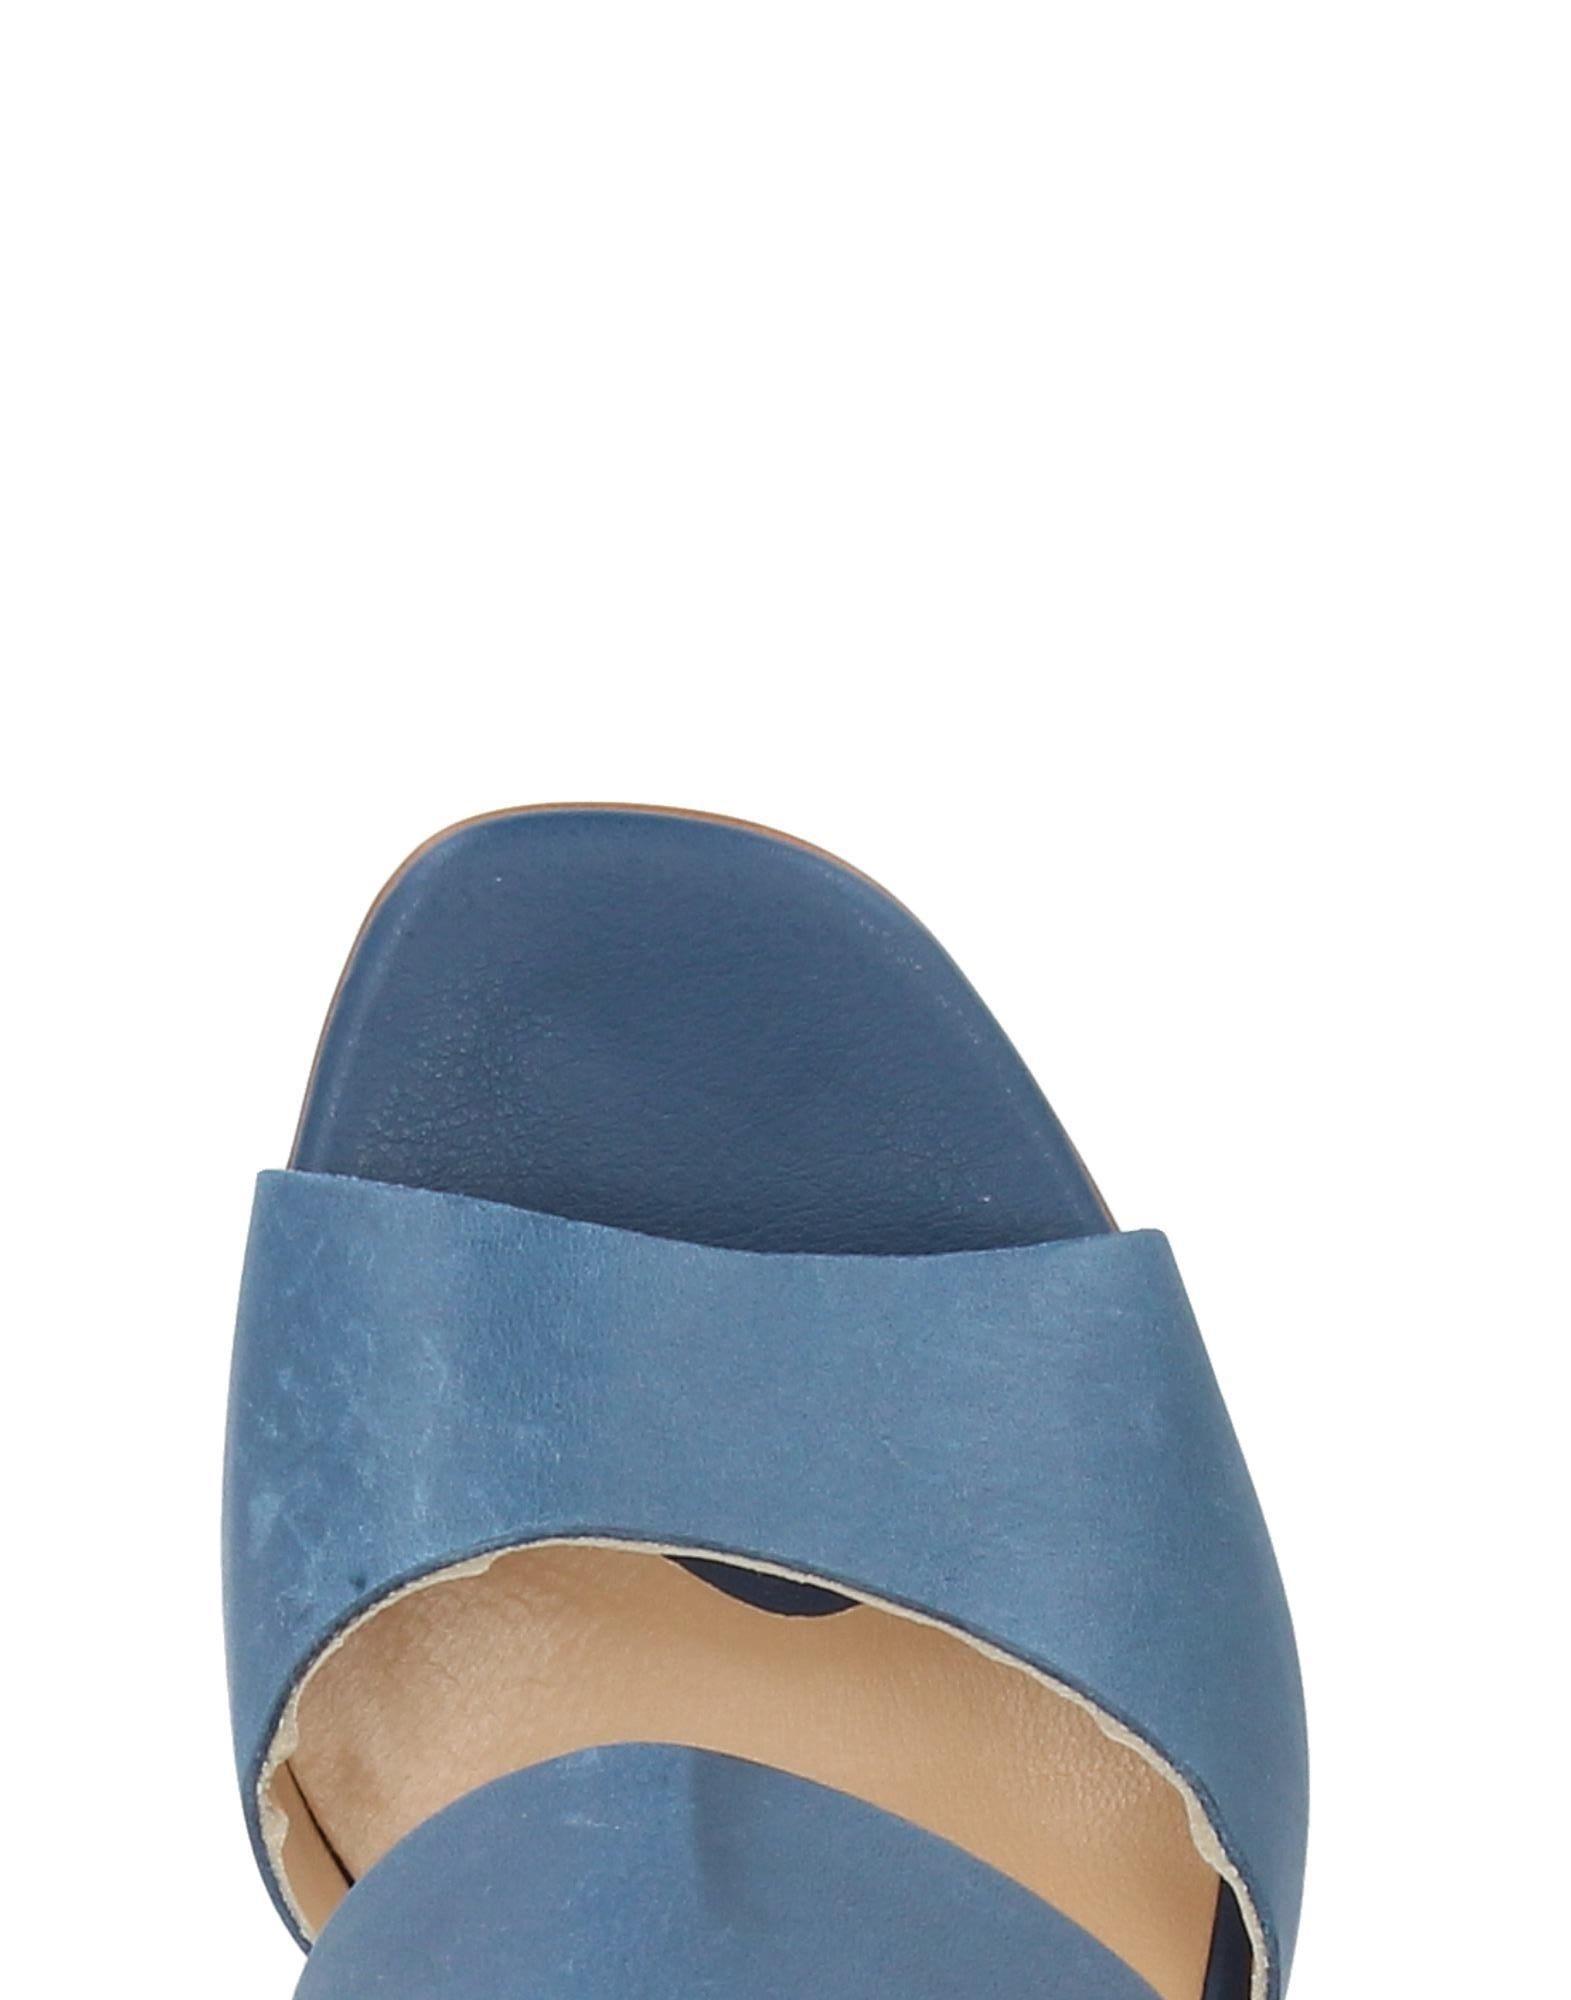 Donna Più Sandalen Damen  11381750SP Gute Qualität beliebte Schuhe